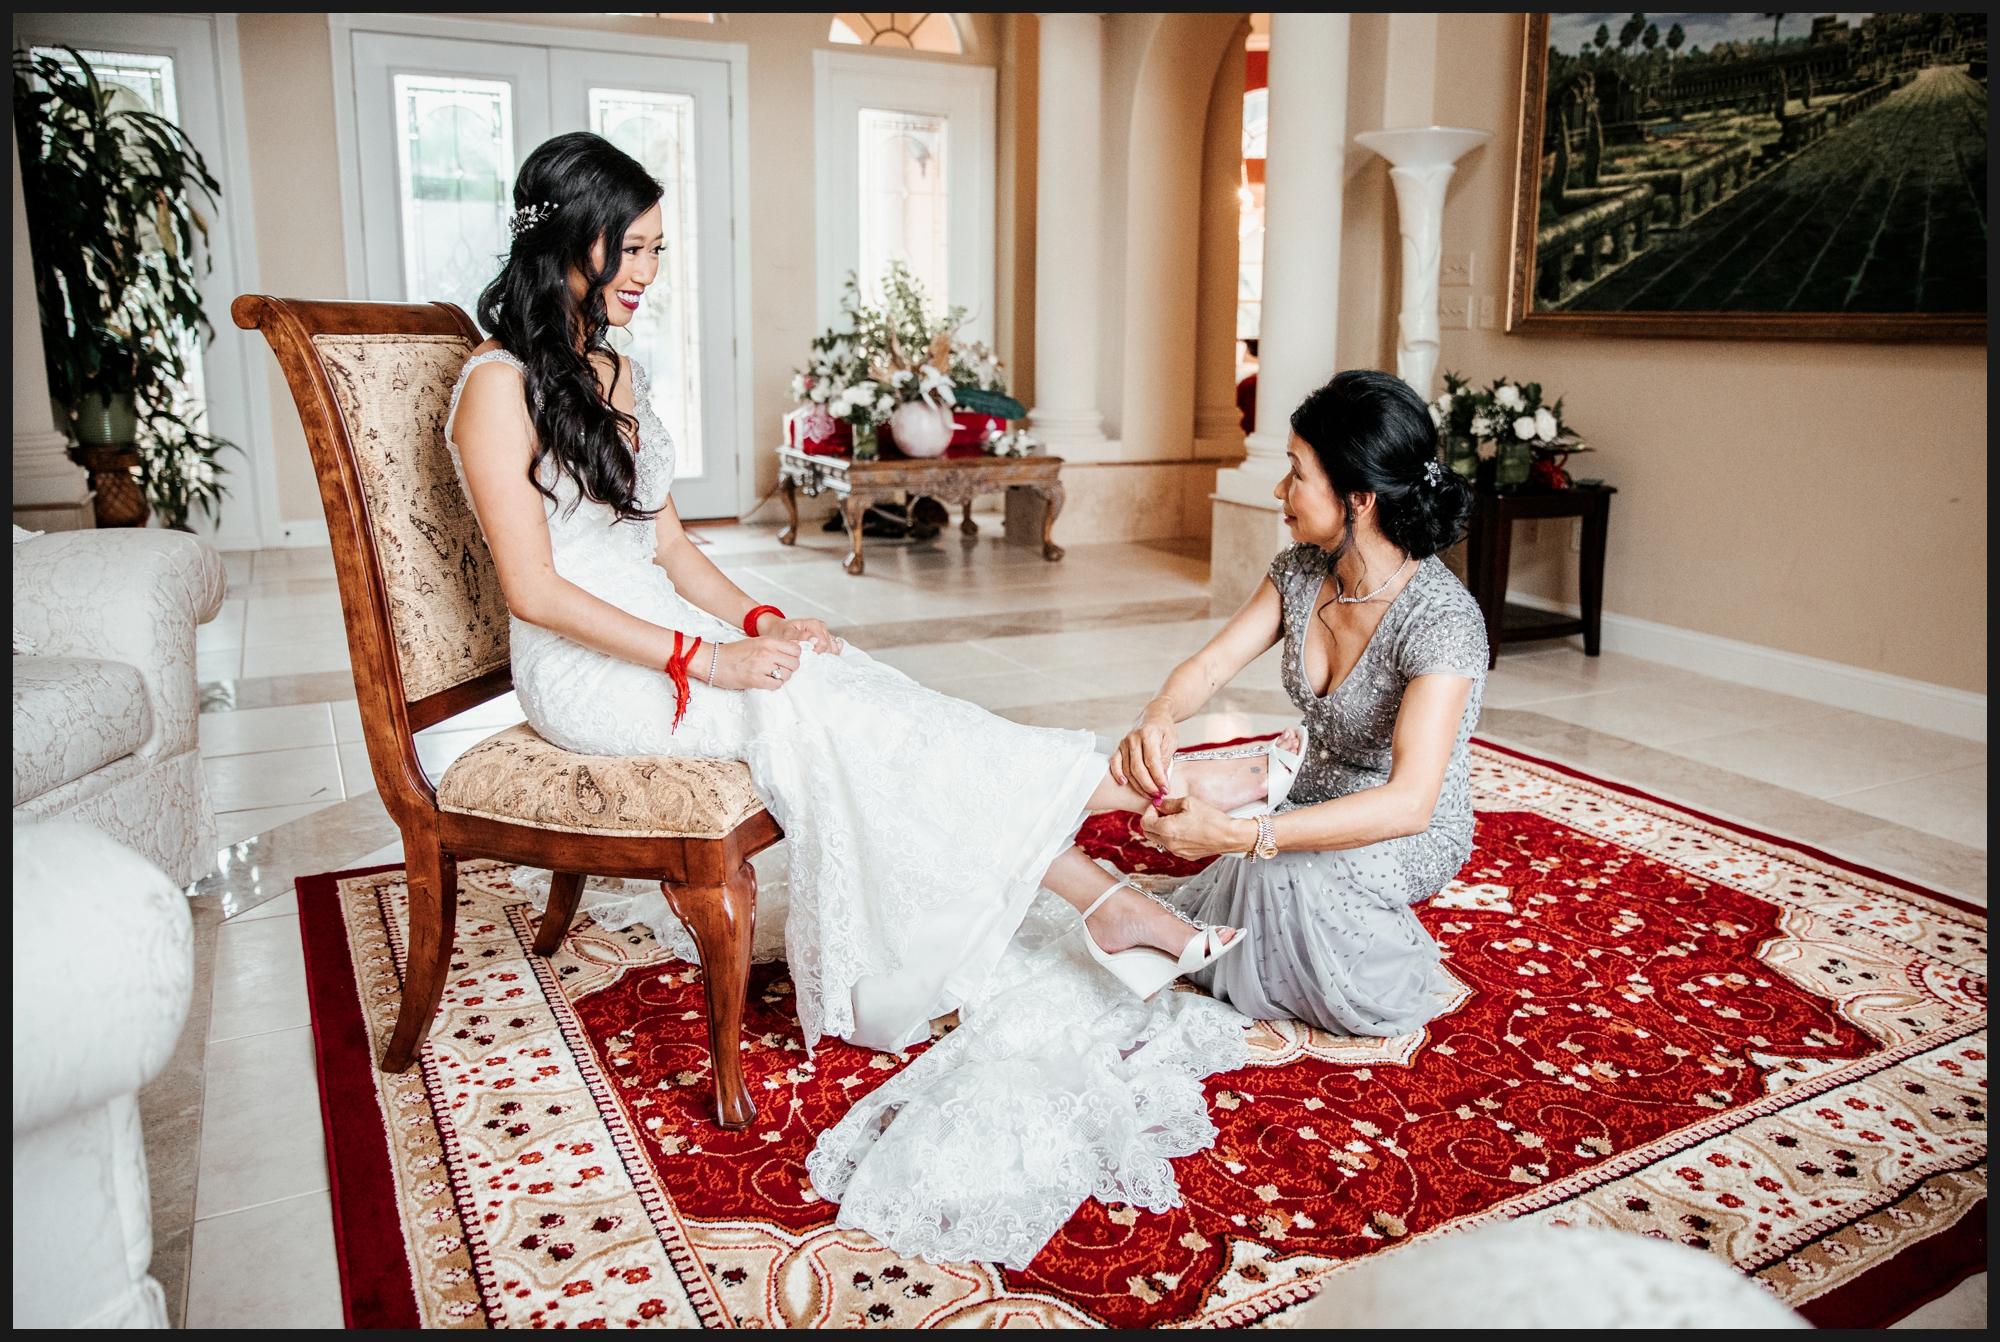 Orlando-Wedding-Photographer-destination-wedding-photographer-florida-wedding-photographer-bohemian-wedding-photographer_1405.jpg